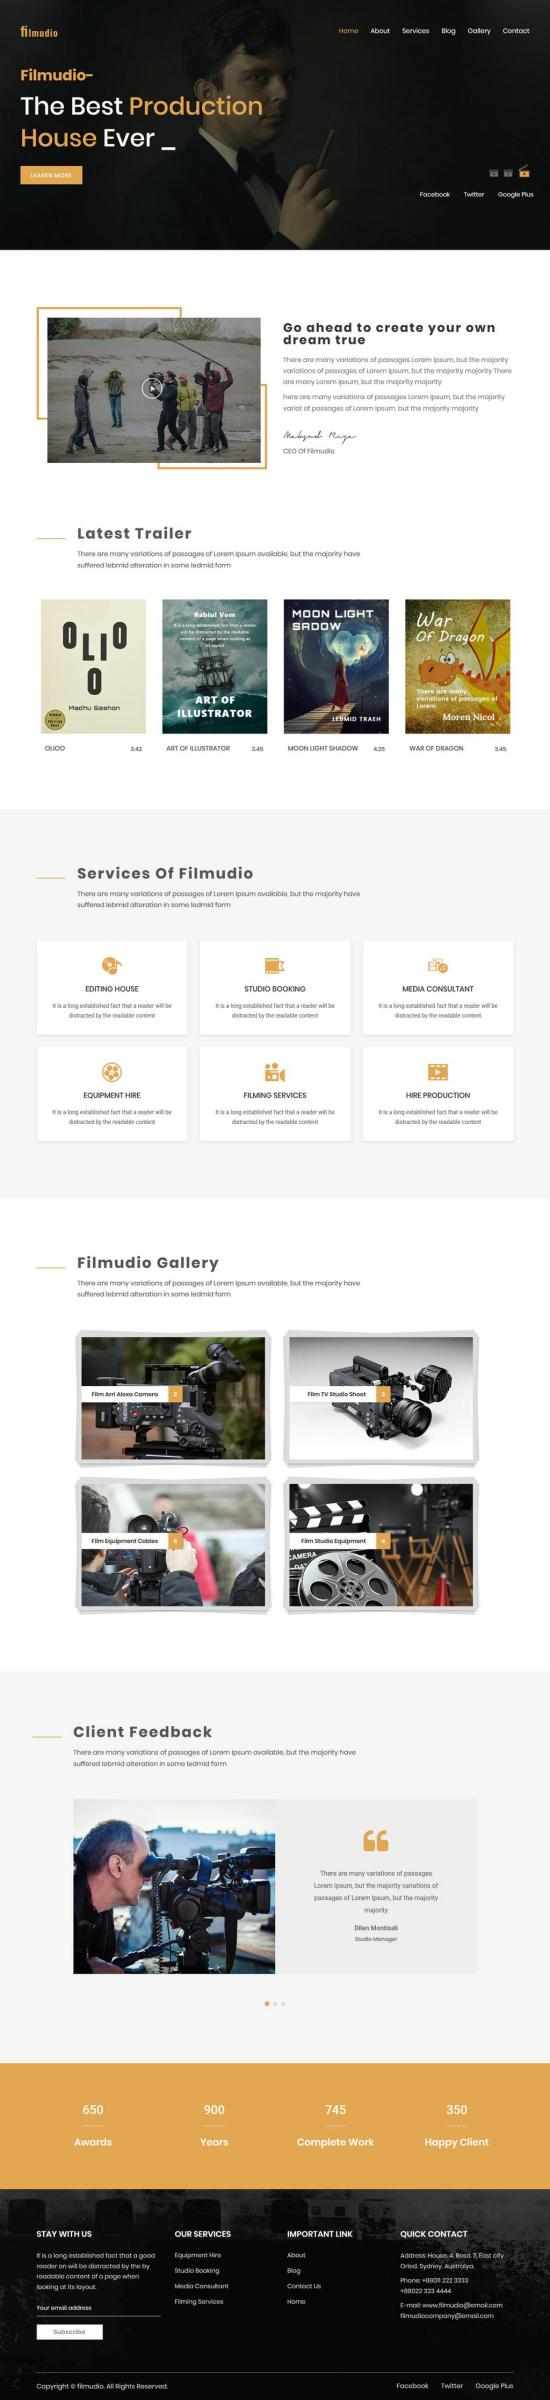 filmudio wordpress theme 01 - Filmudio WordPress Theme